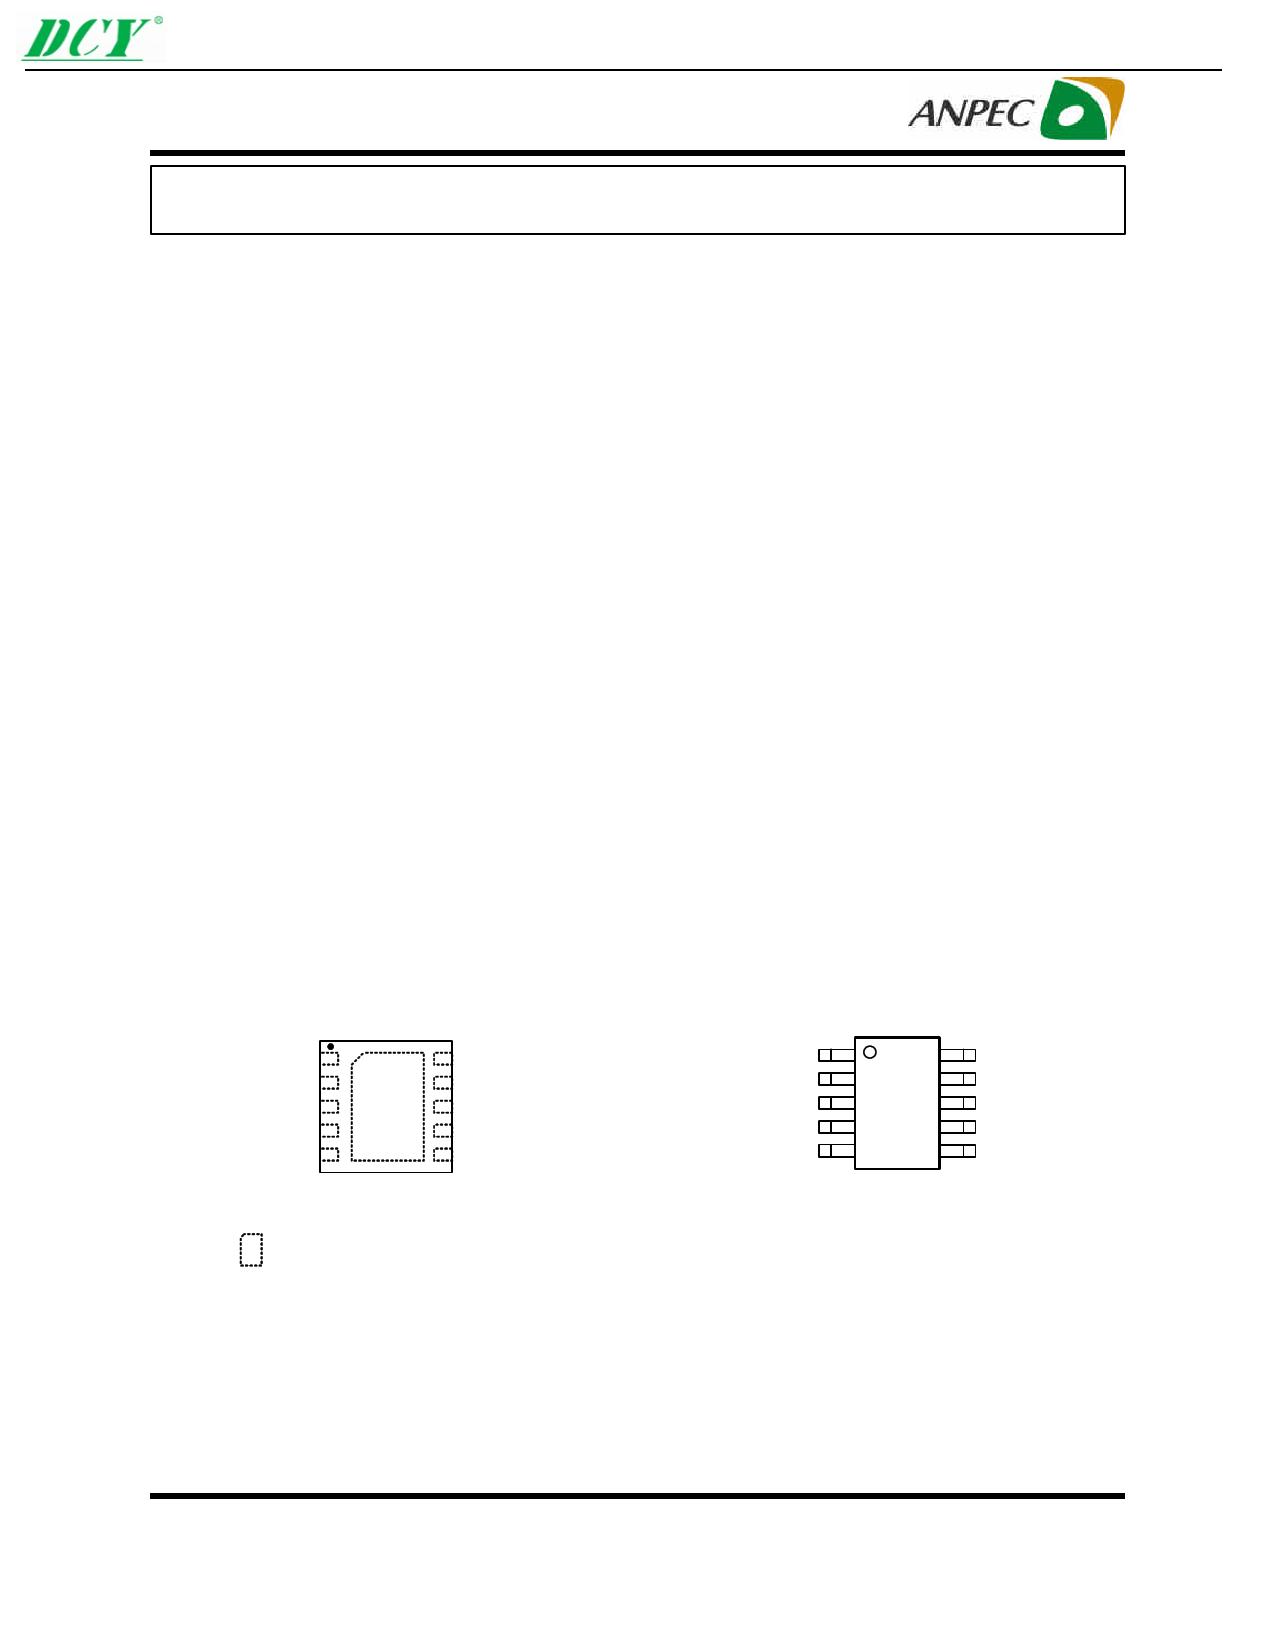 apx9358 数据手册, 描述, 功能